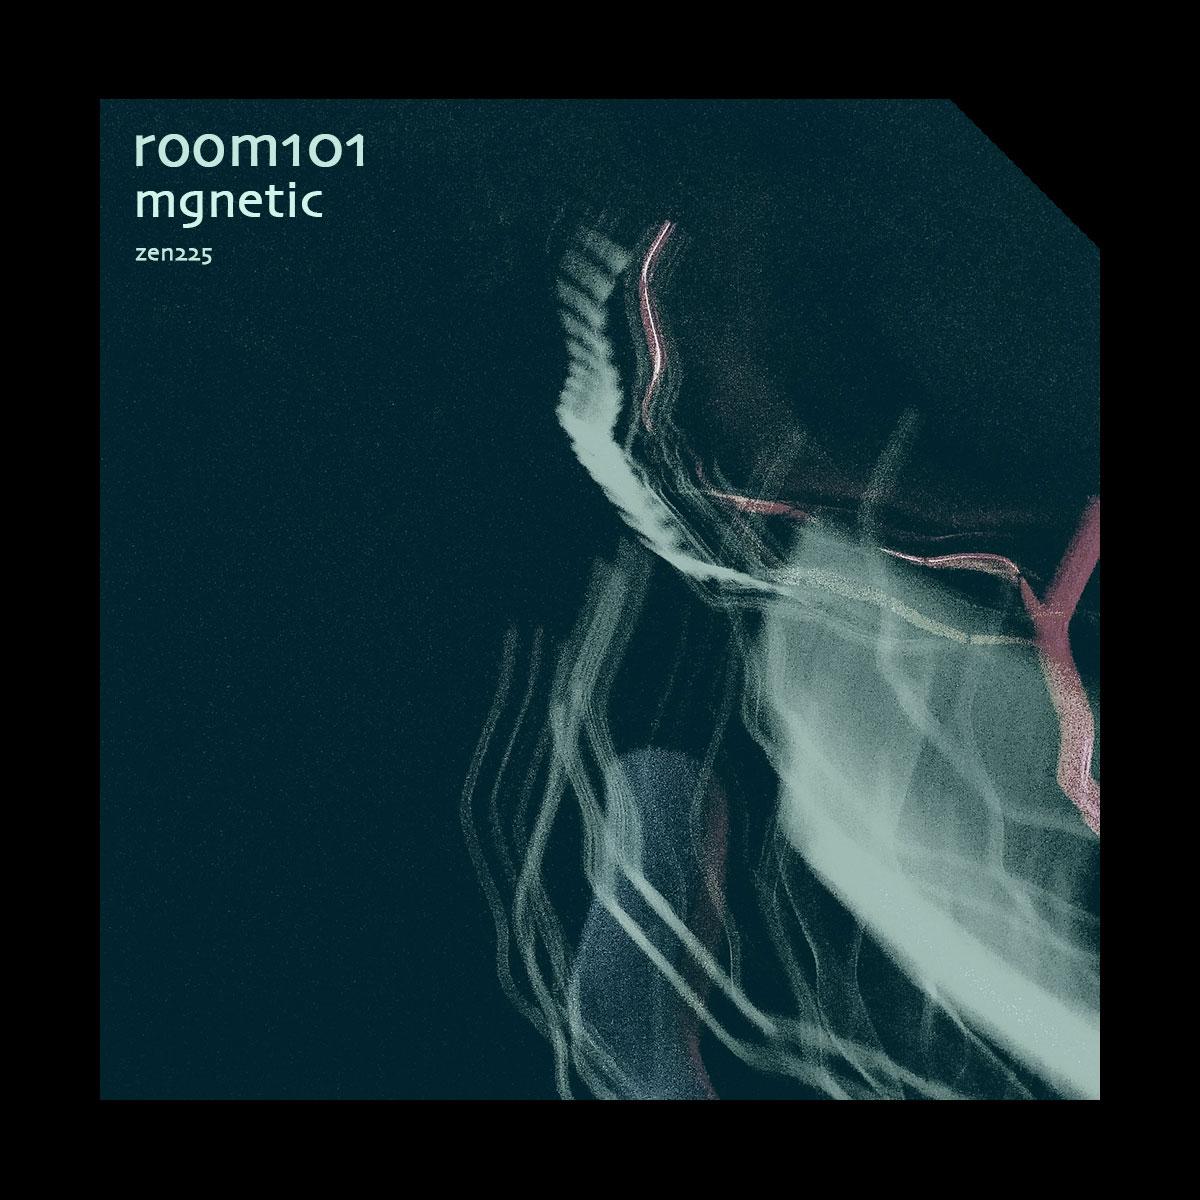 room101 – mgnetic